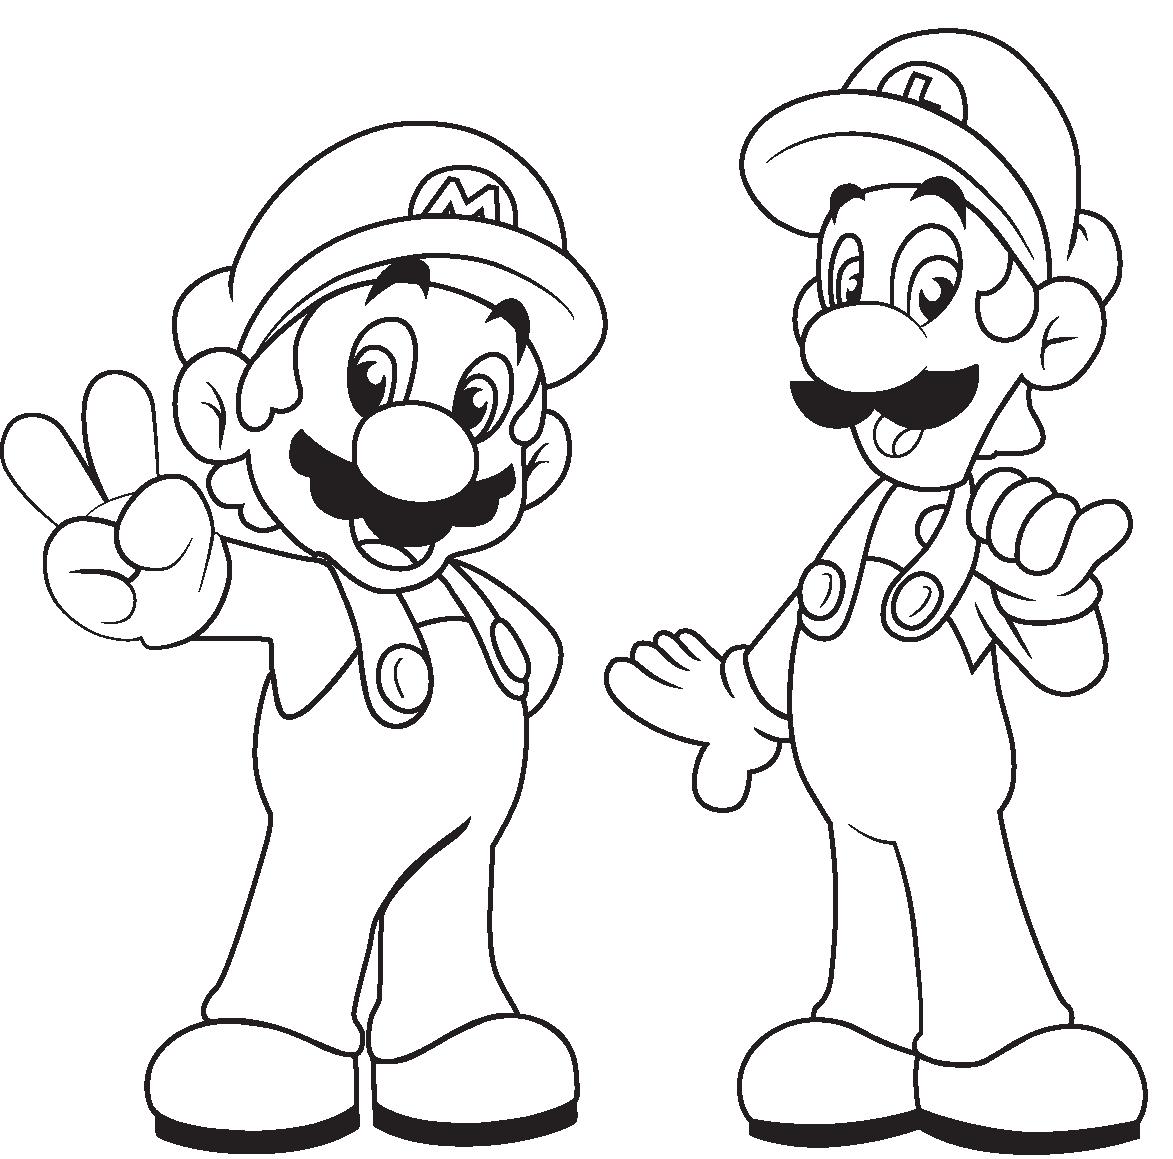 1173x1159 Mario Mario And Luigi Mario